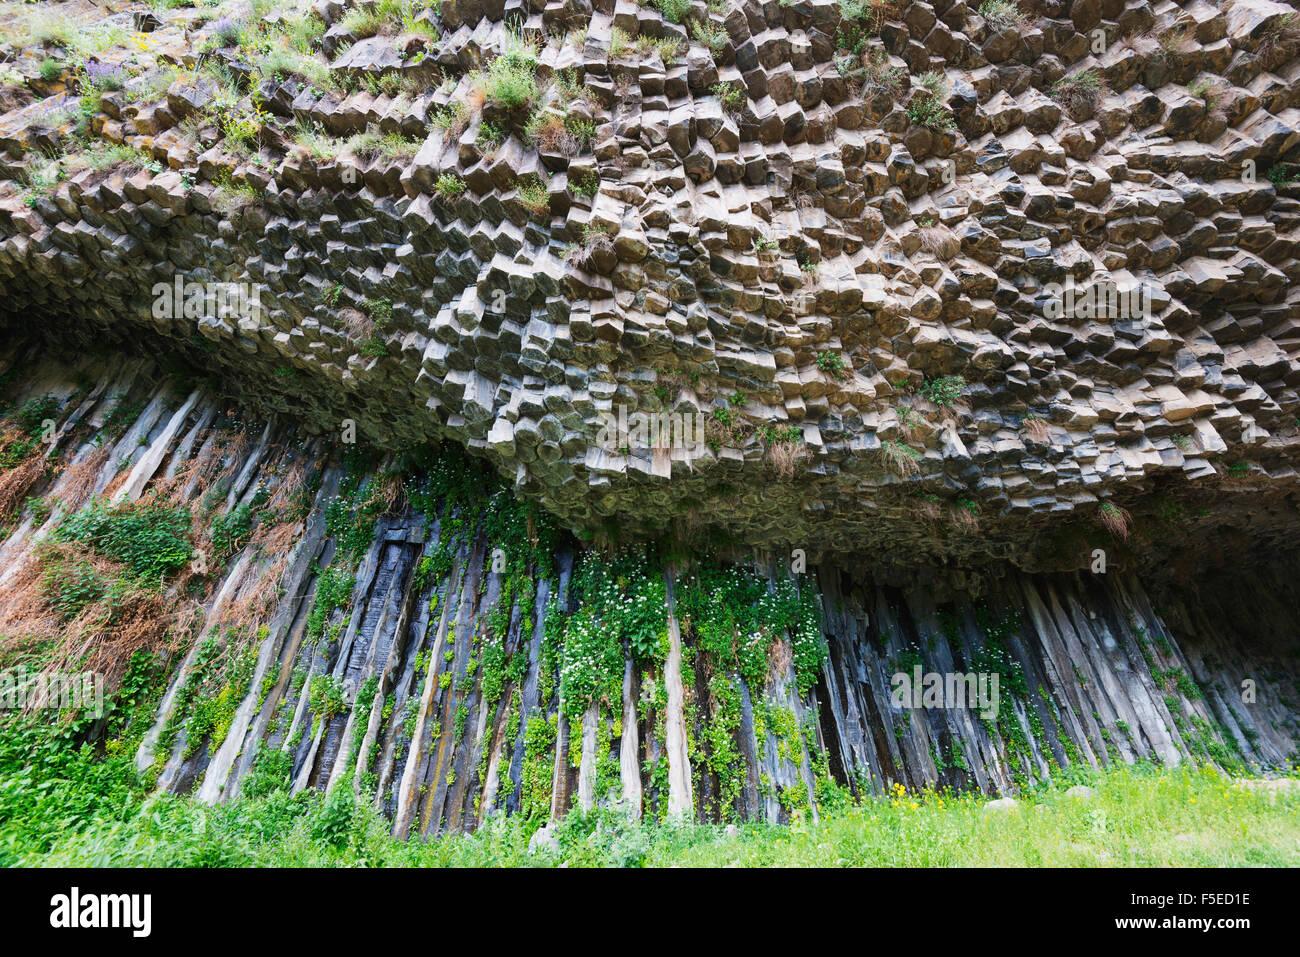 Symphony of Stones basalt columns, UNESCO World Heritage Site, Garni, Kotayk Province, Armenia, Caucasus, Central - Stock Image